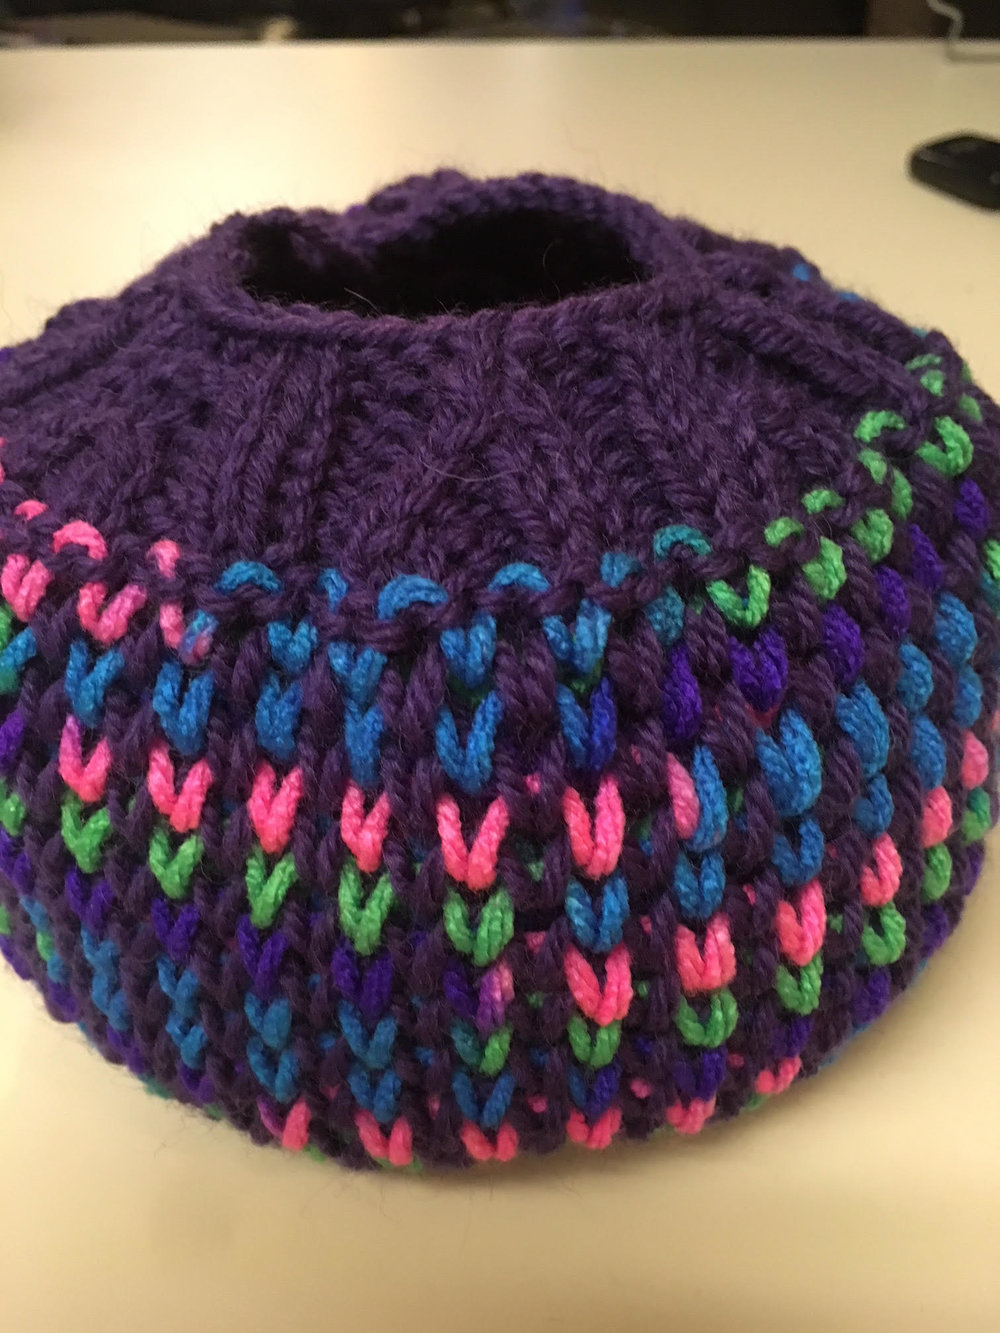 Laura's beautiful ponytail hat using Hexagon Stitch.